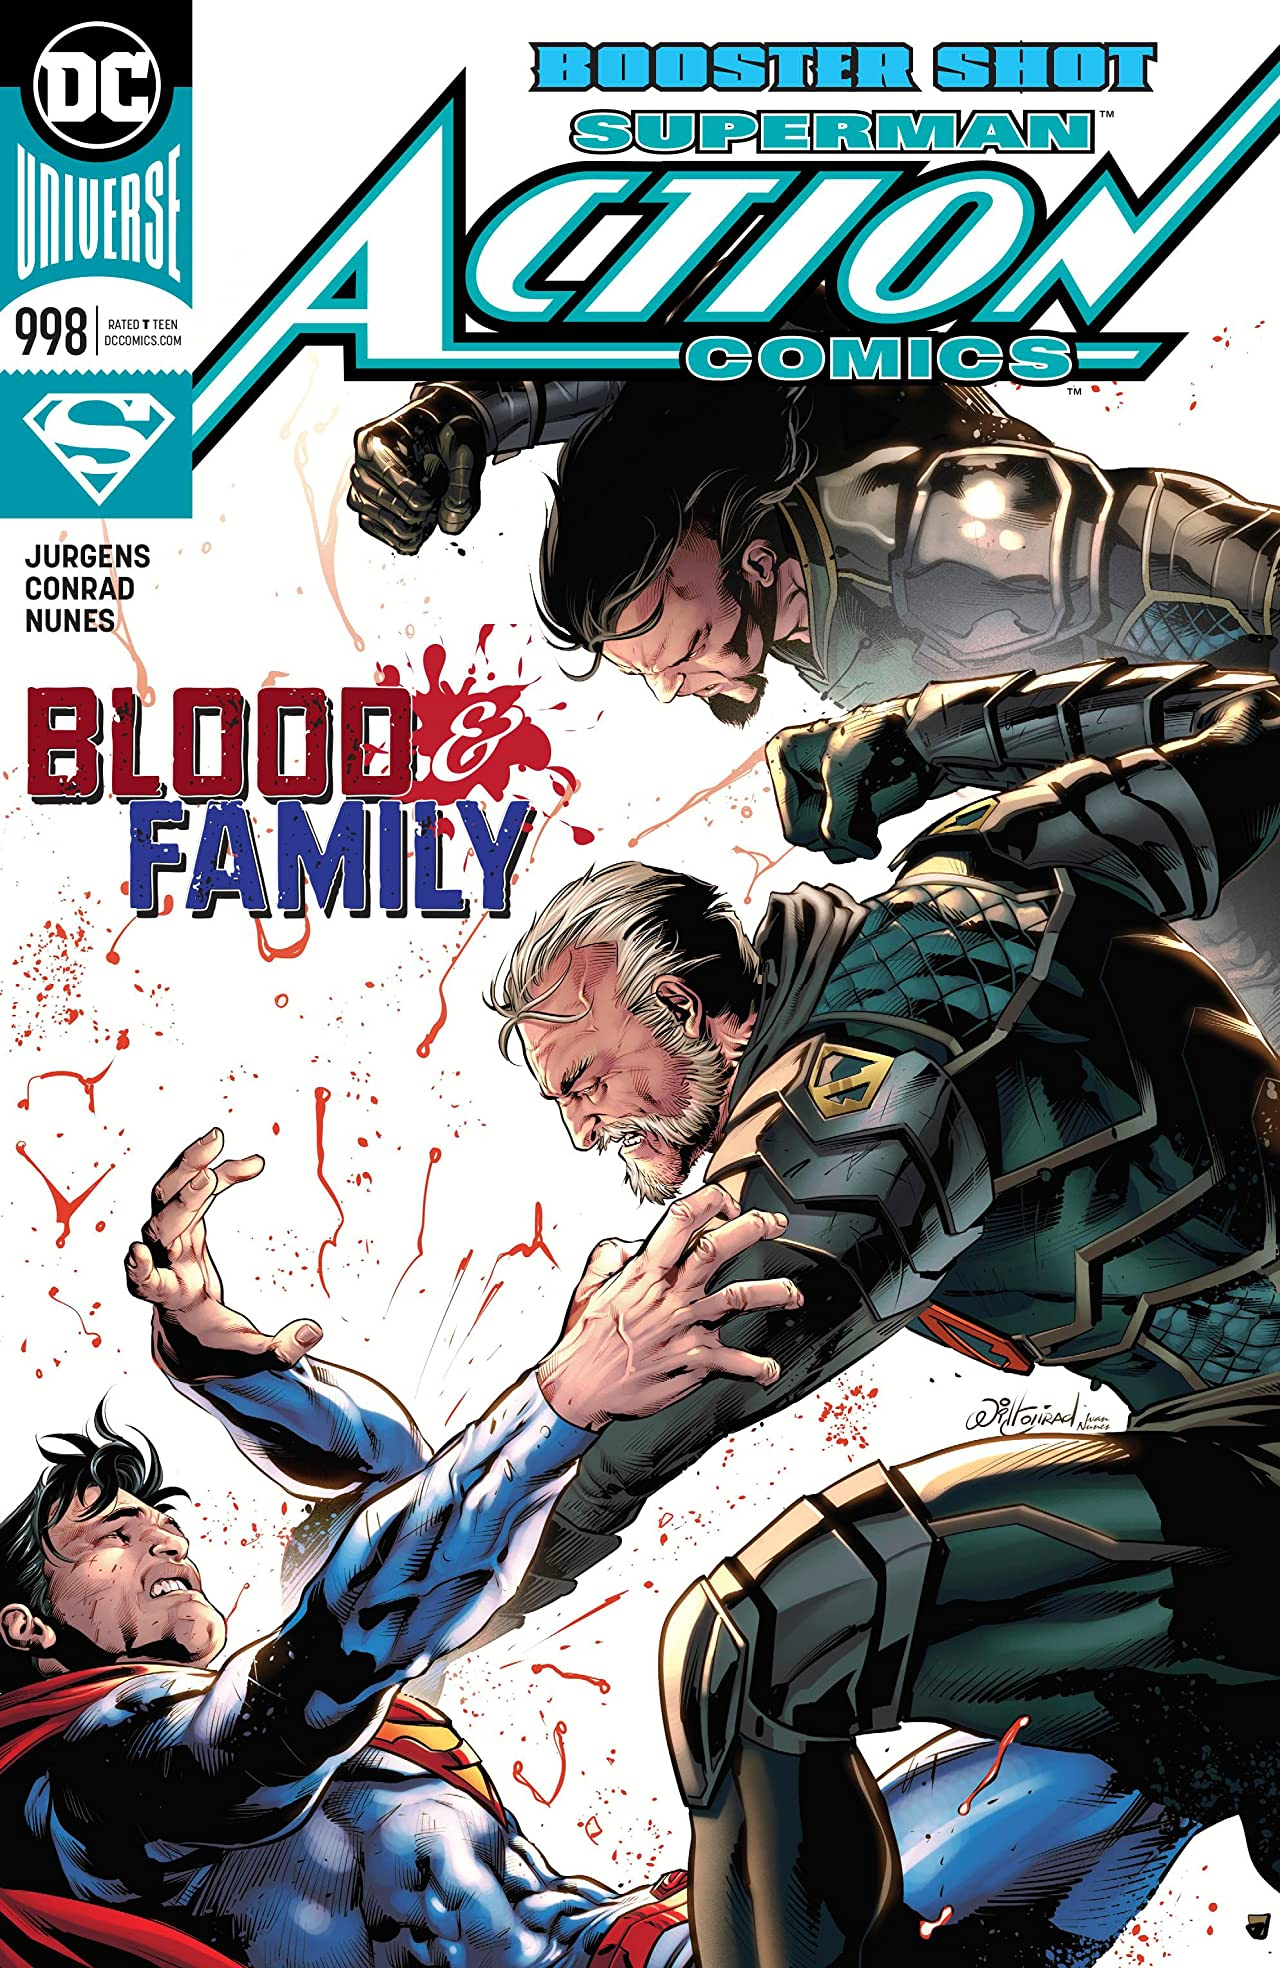 Action Comics (2016-) #998